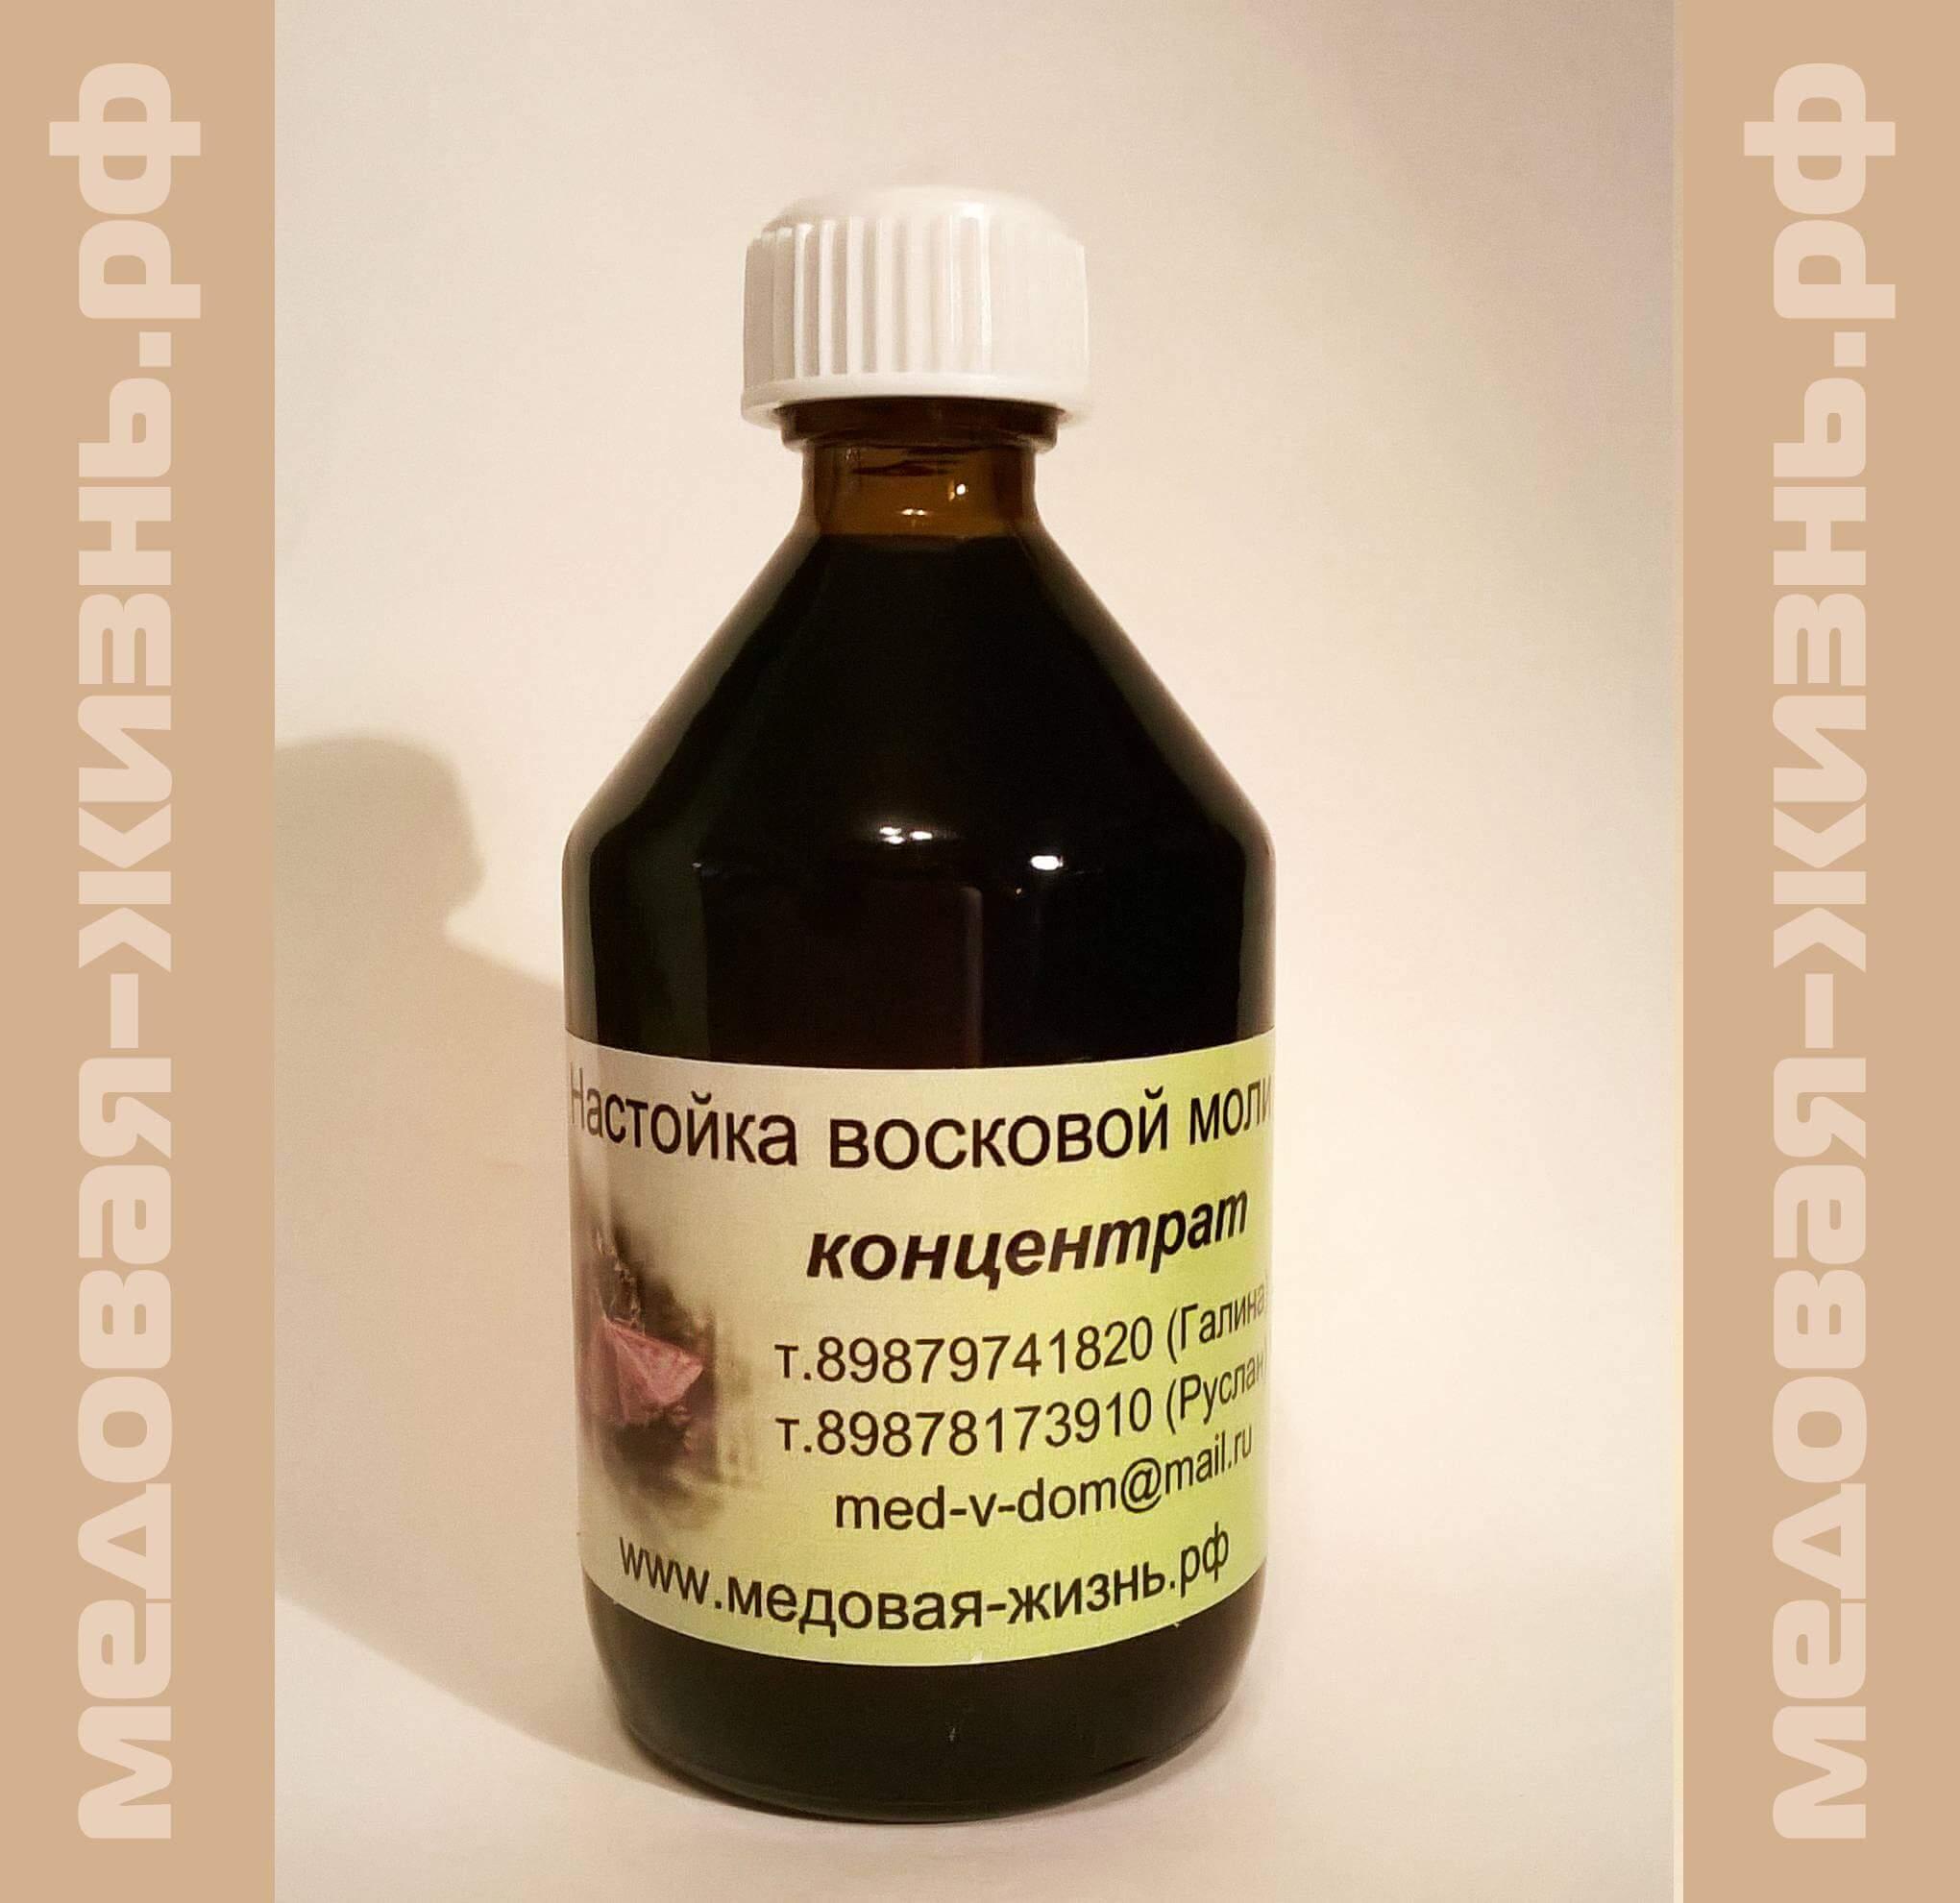 Настойка восковой моли от туберкулеза/пневмонии